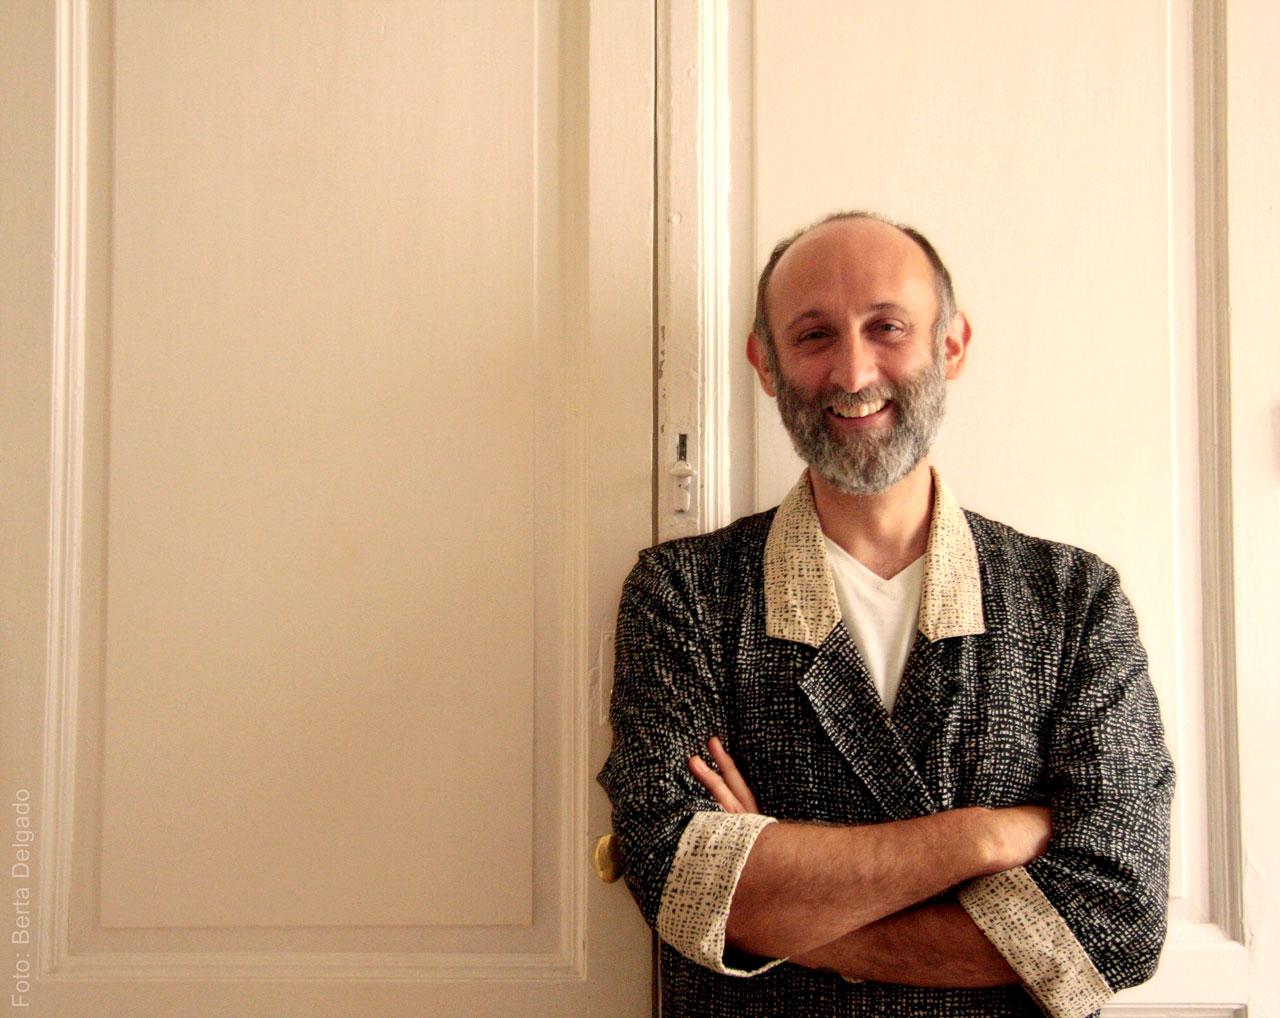 Ivan-Jimenez-Berbes-manager-director-artistico-musical-yanmag